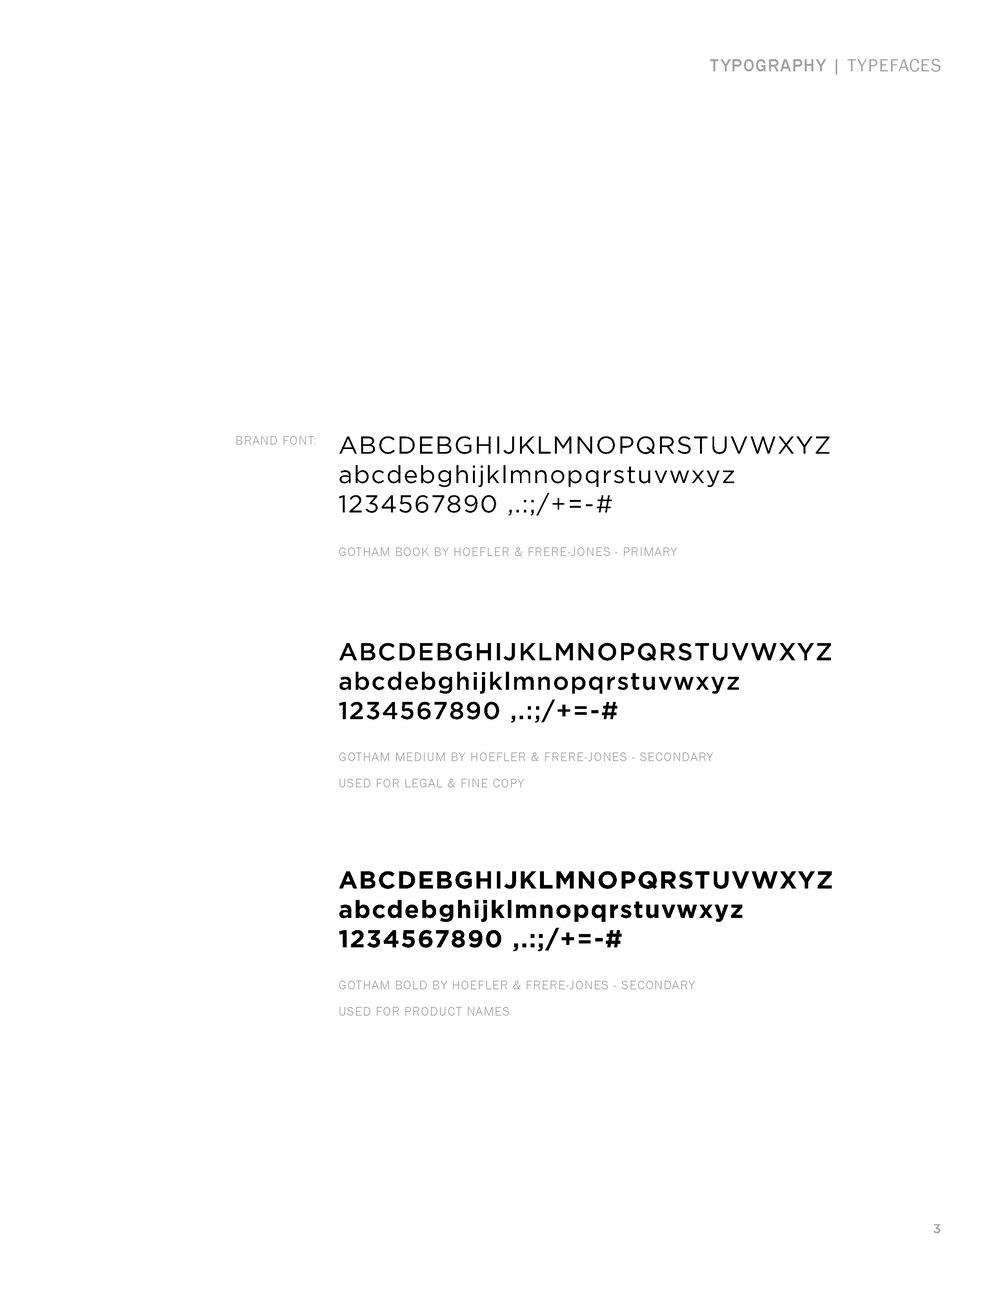 NB_standards_manual_Page_03.jpg